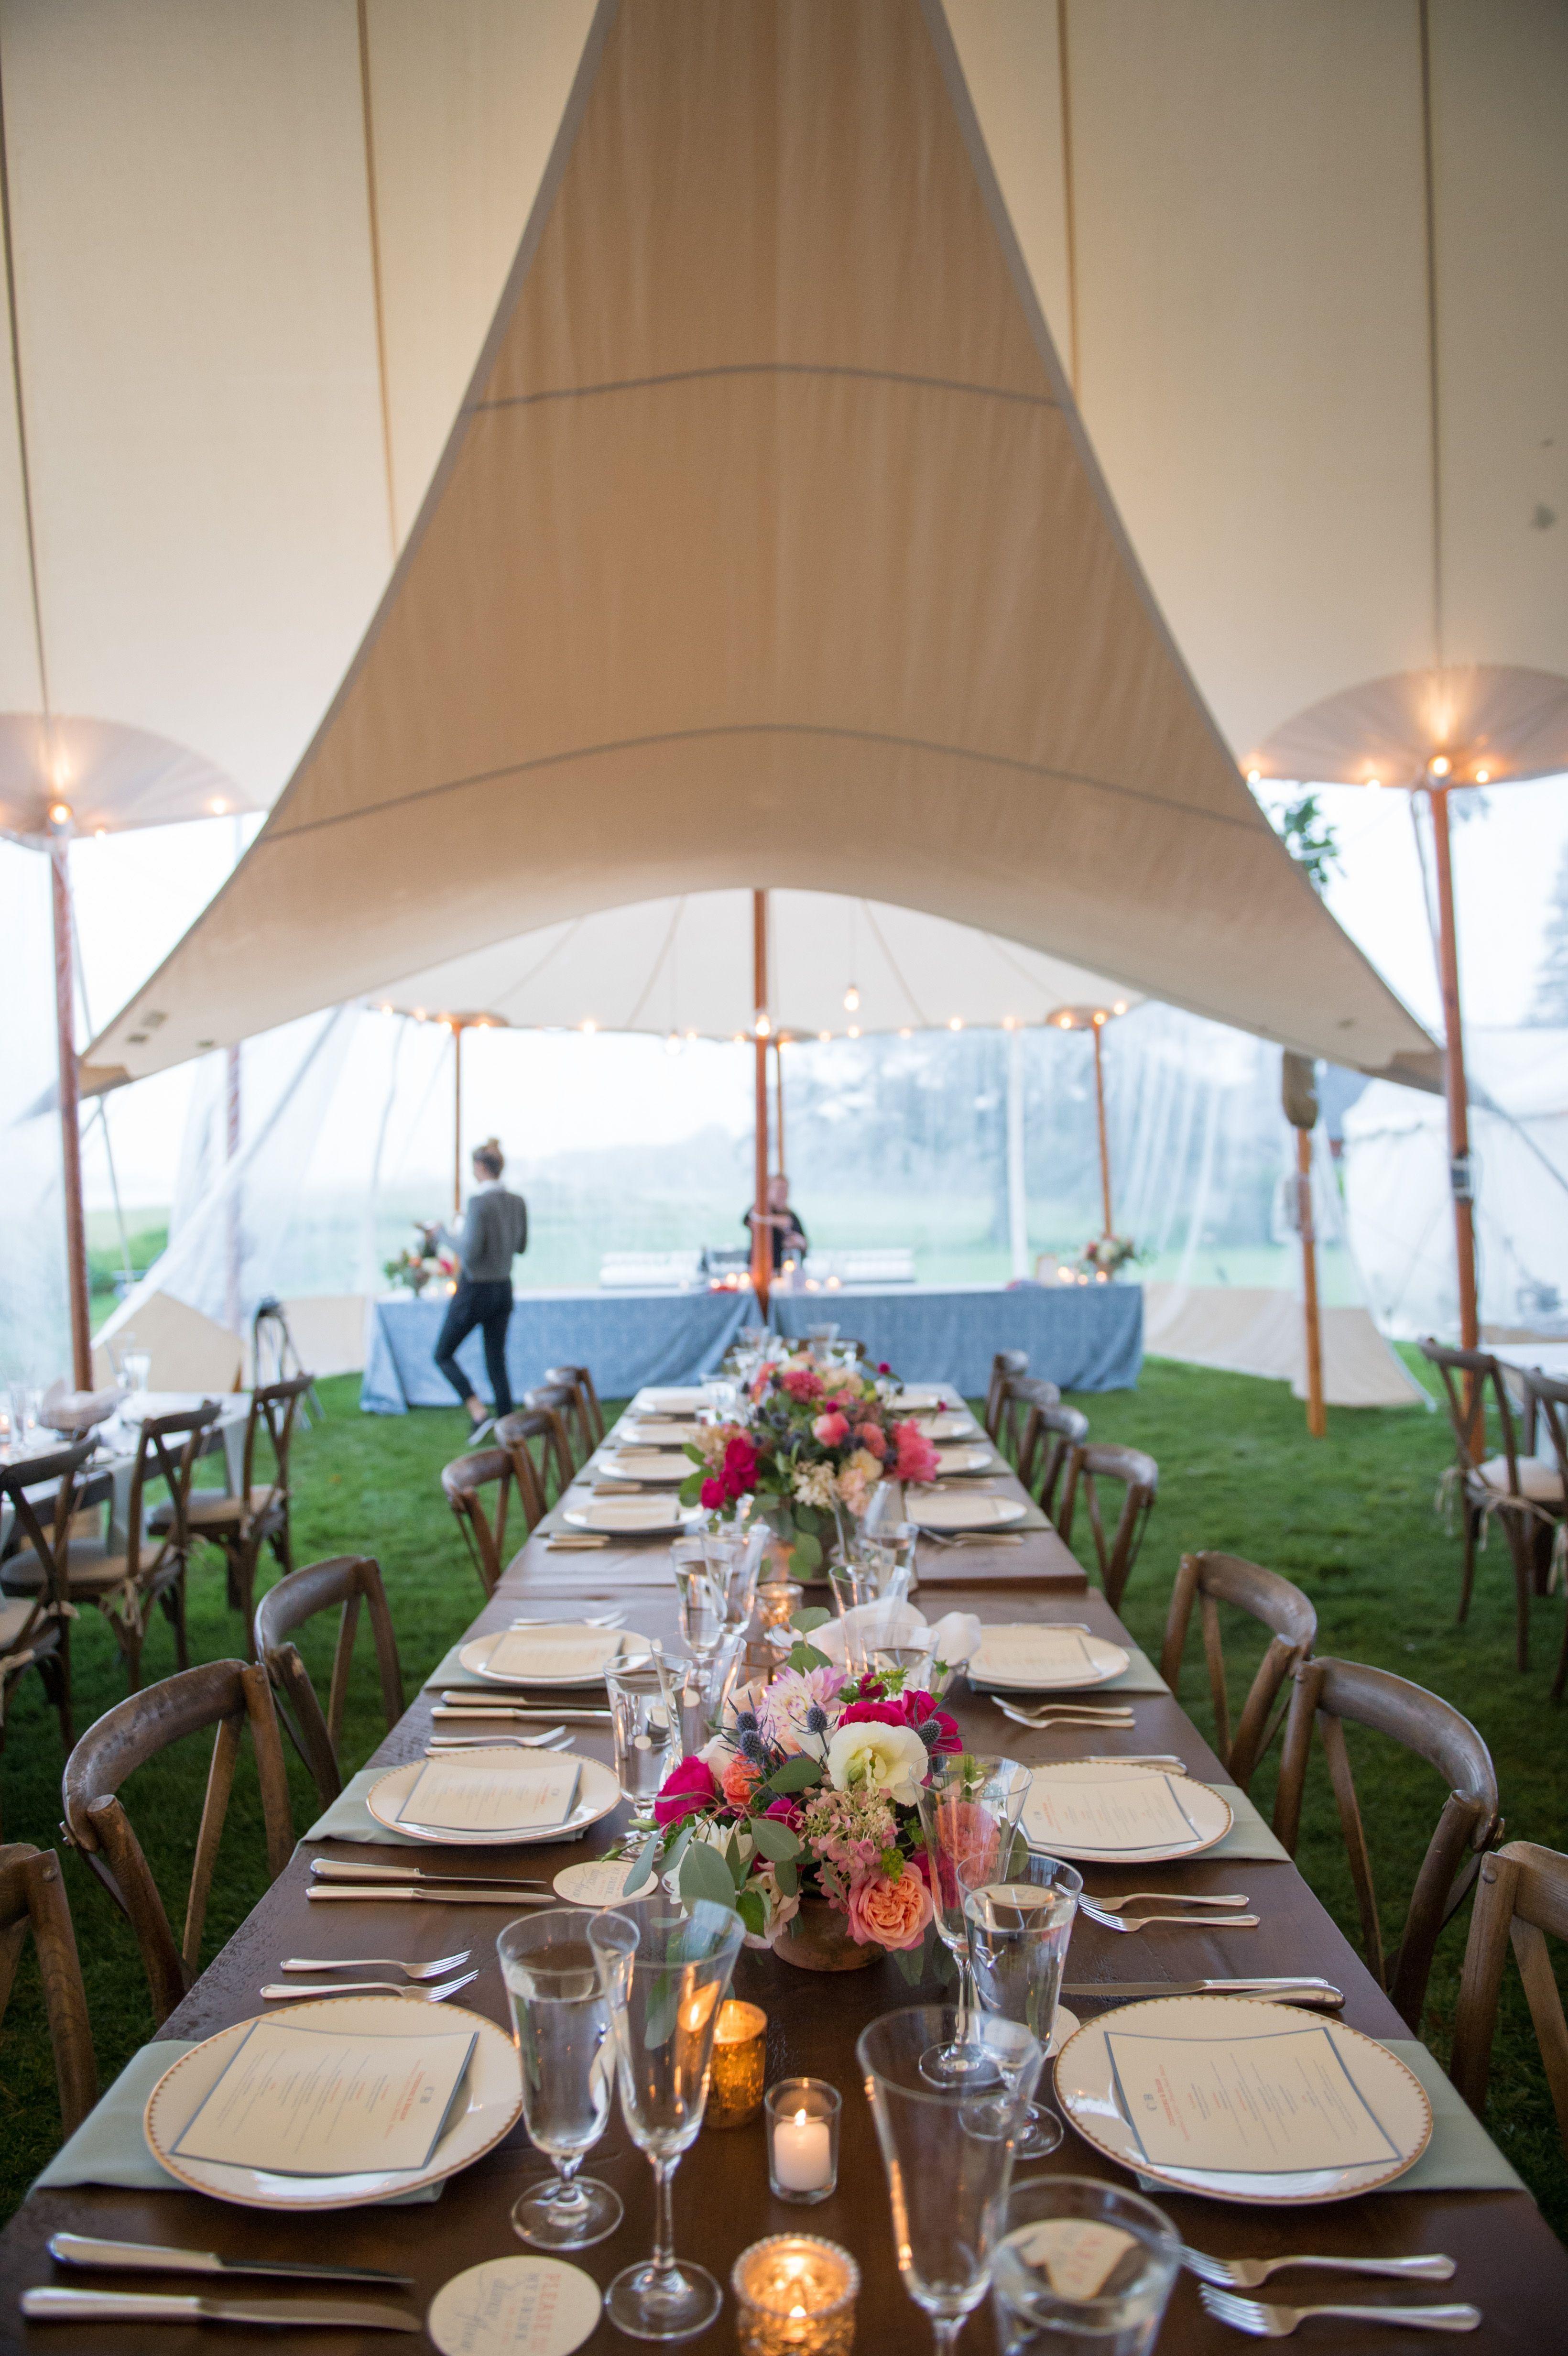 Brea Mcdonald Photography Kennebunk Maine Wedding Tented